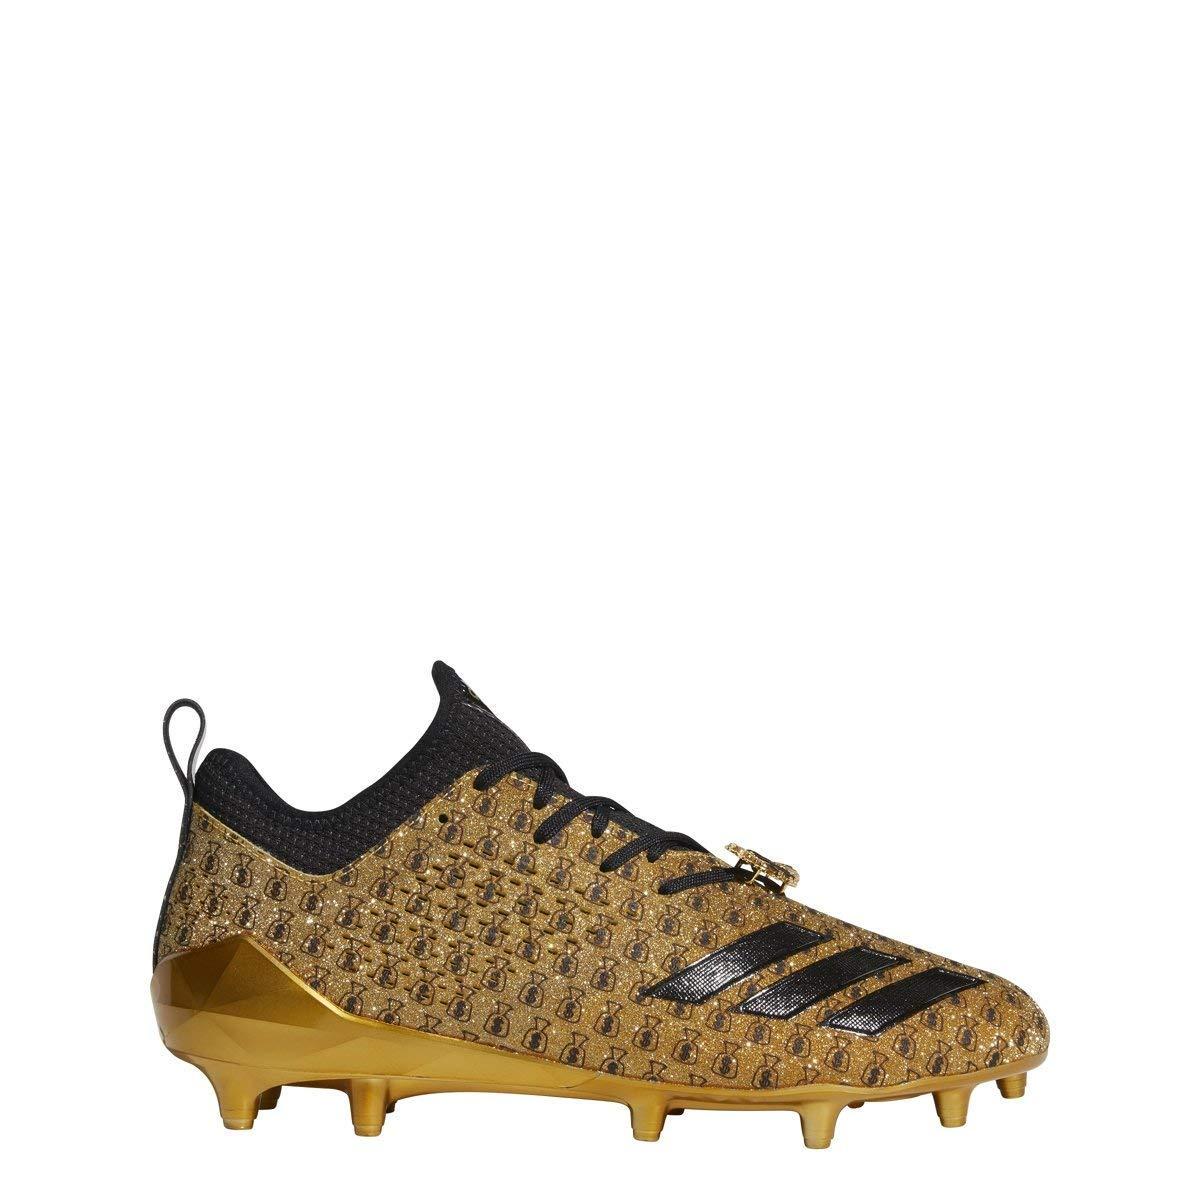 42e12966b8 adidas Adizero 5-Star 7.0 7v7 Cleat - Men's Football